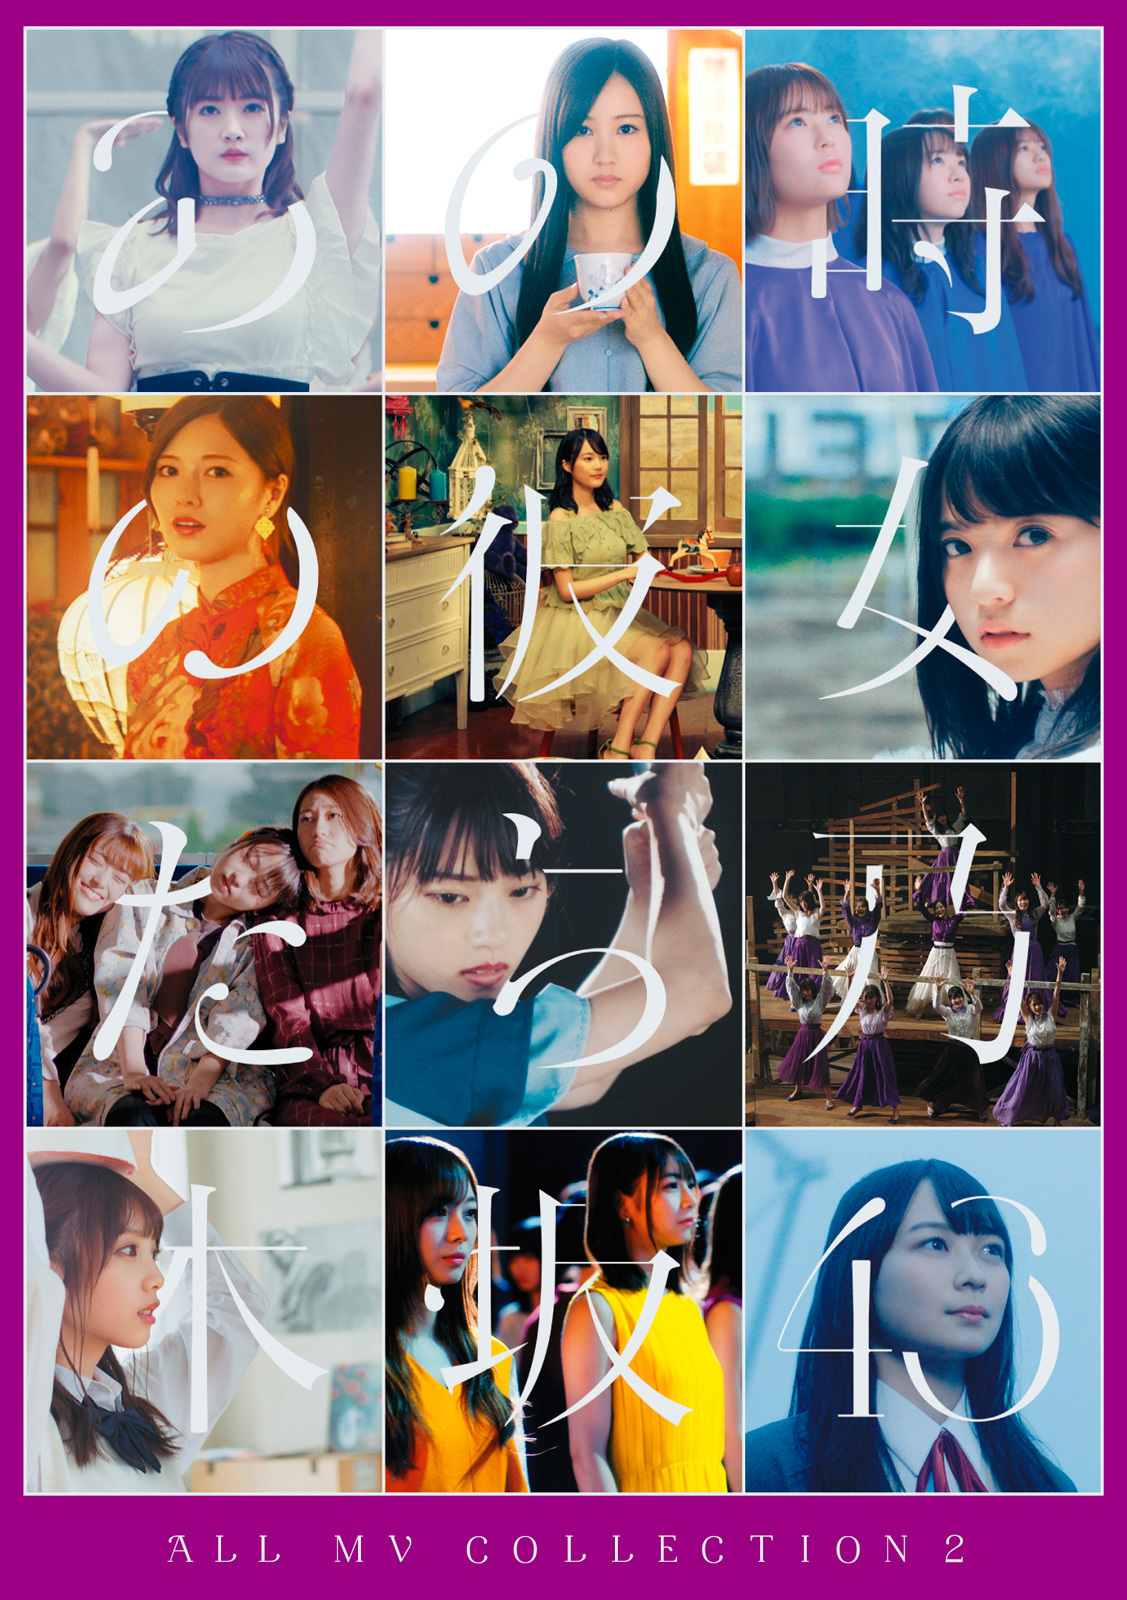 乃木坂46「ALL MV COLLECTION 2」ジャケ写 初回仕様限定盤DVD